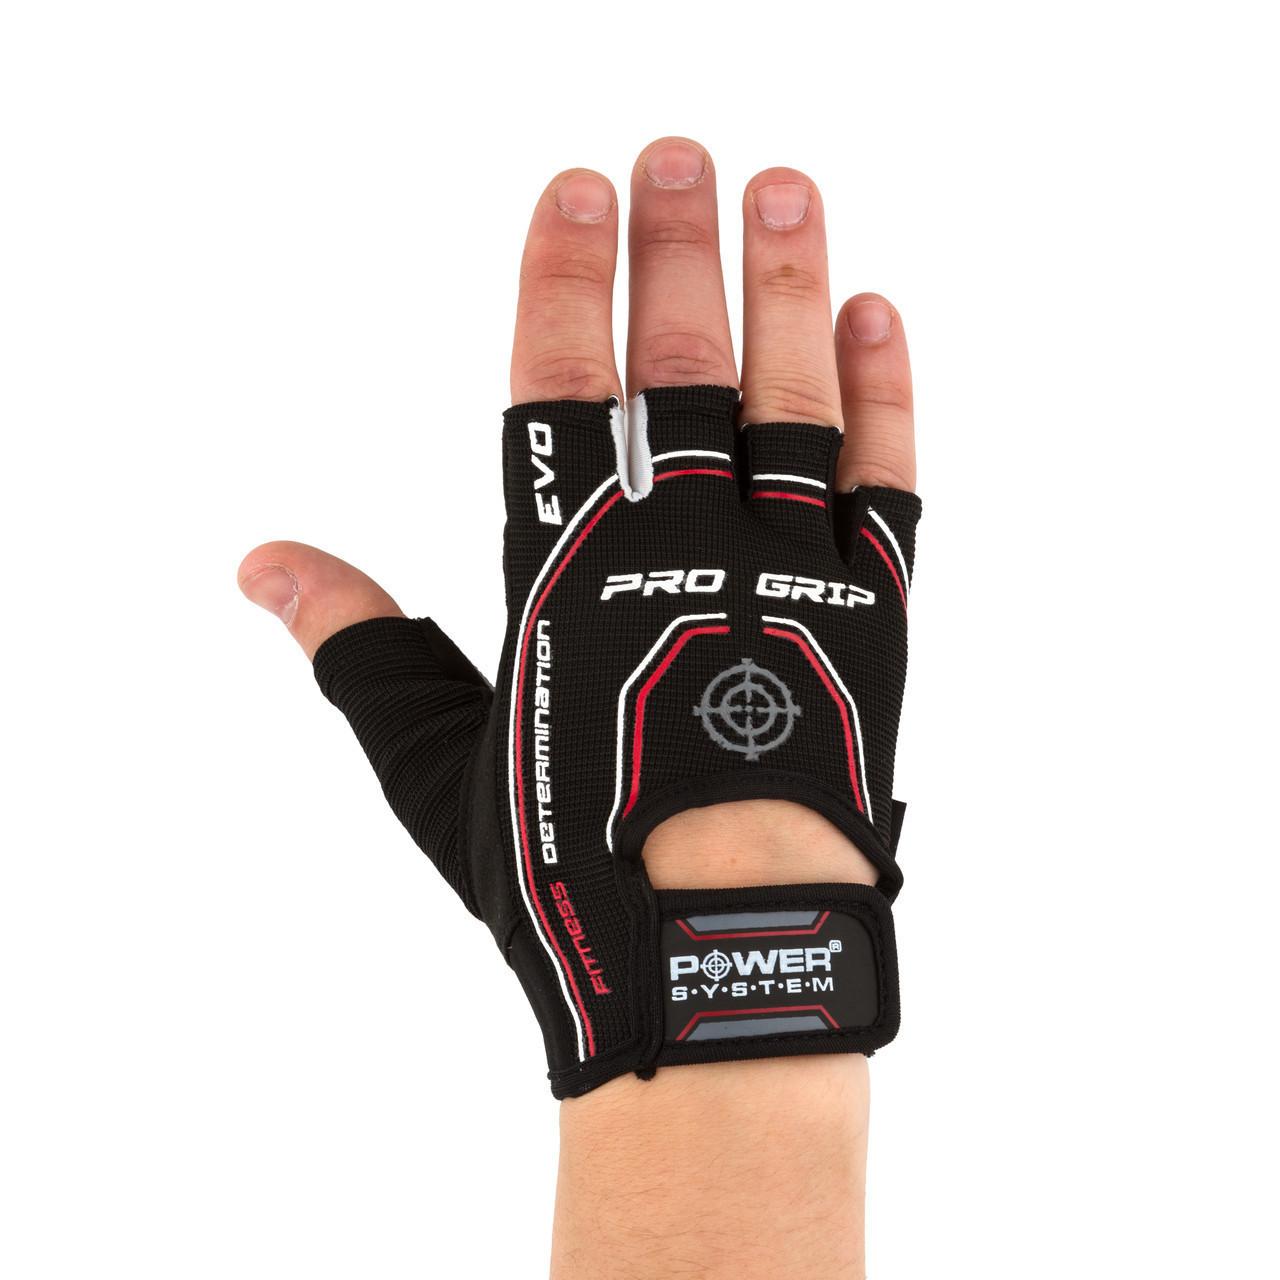 Перчатки для фитнеса и тяжелой атлетики Power System Pro Grip EVO PS-2250E S Black